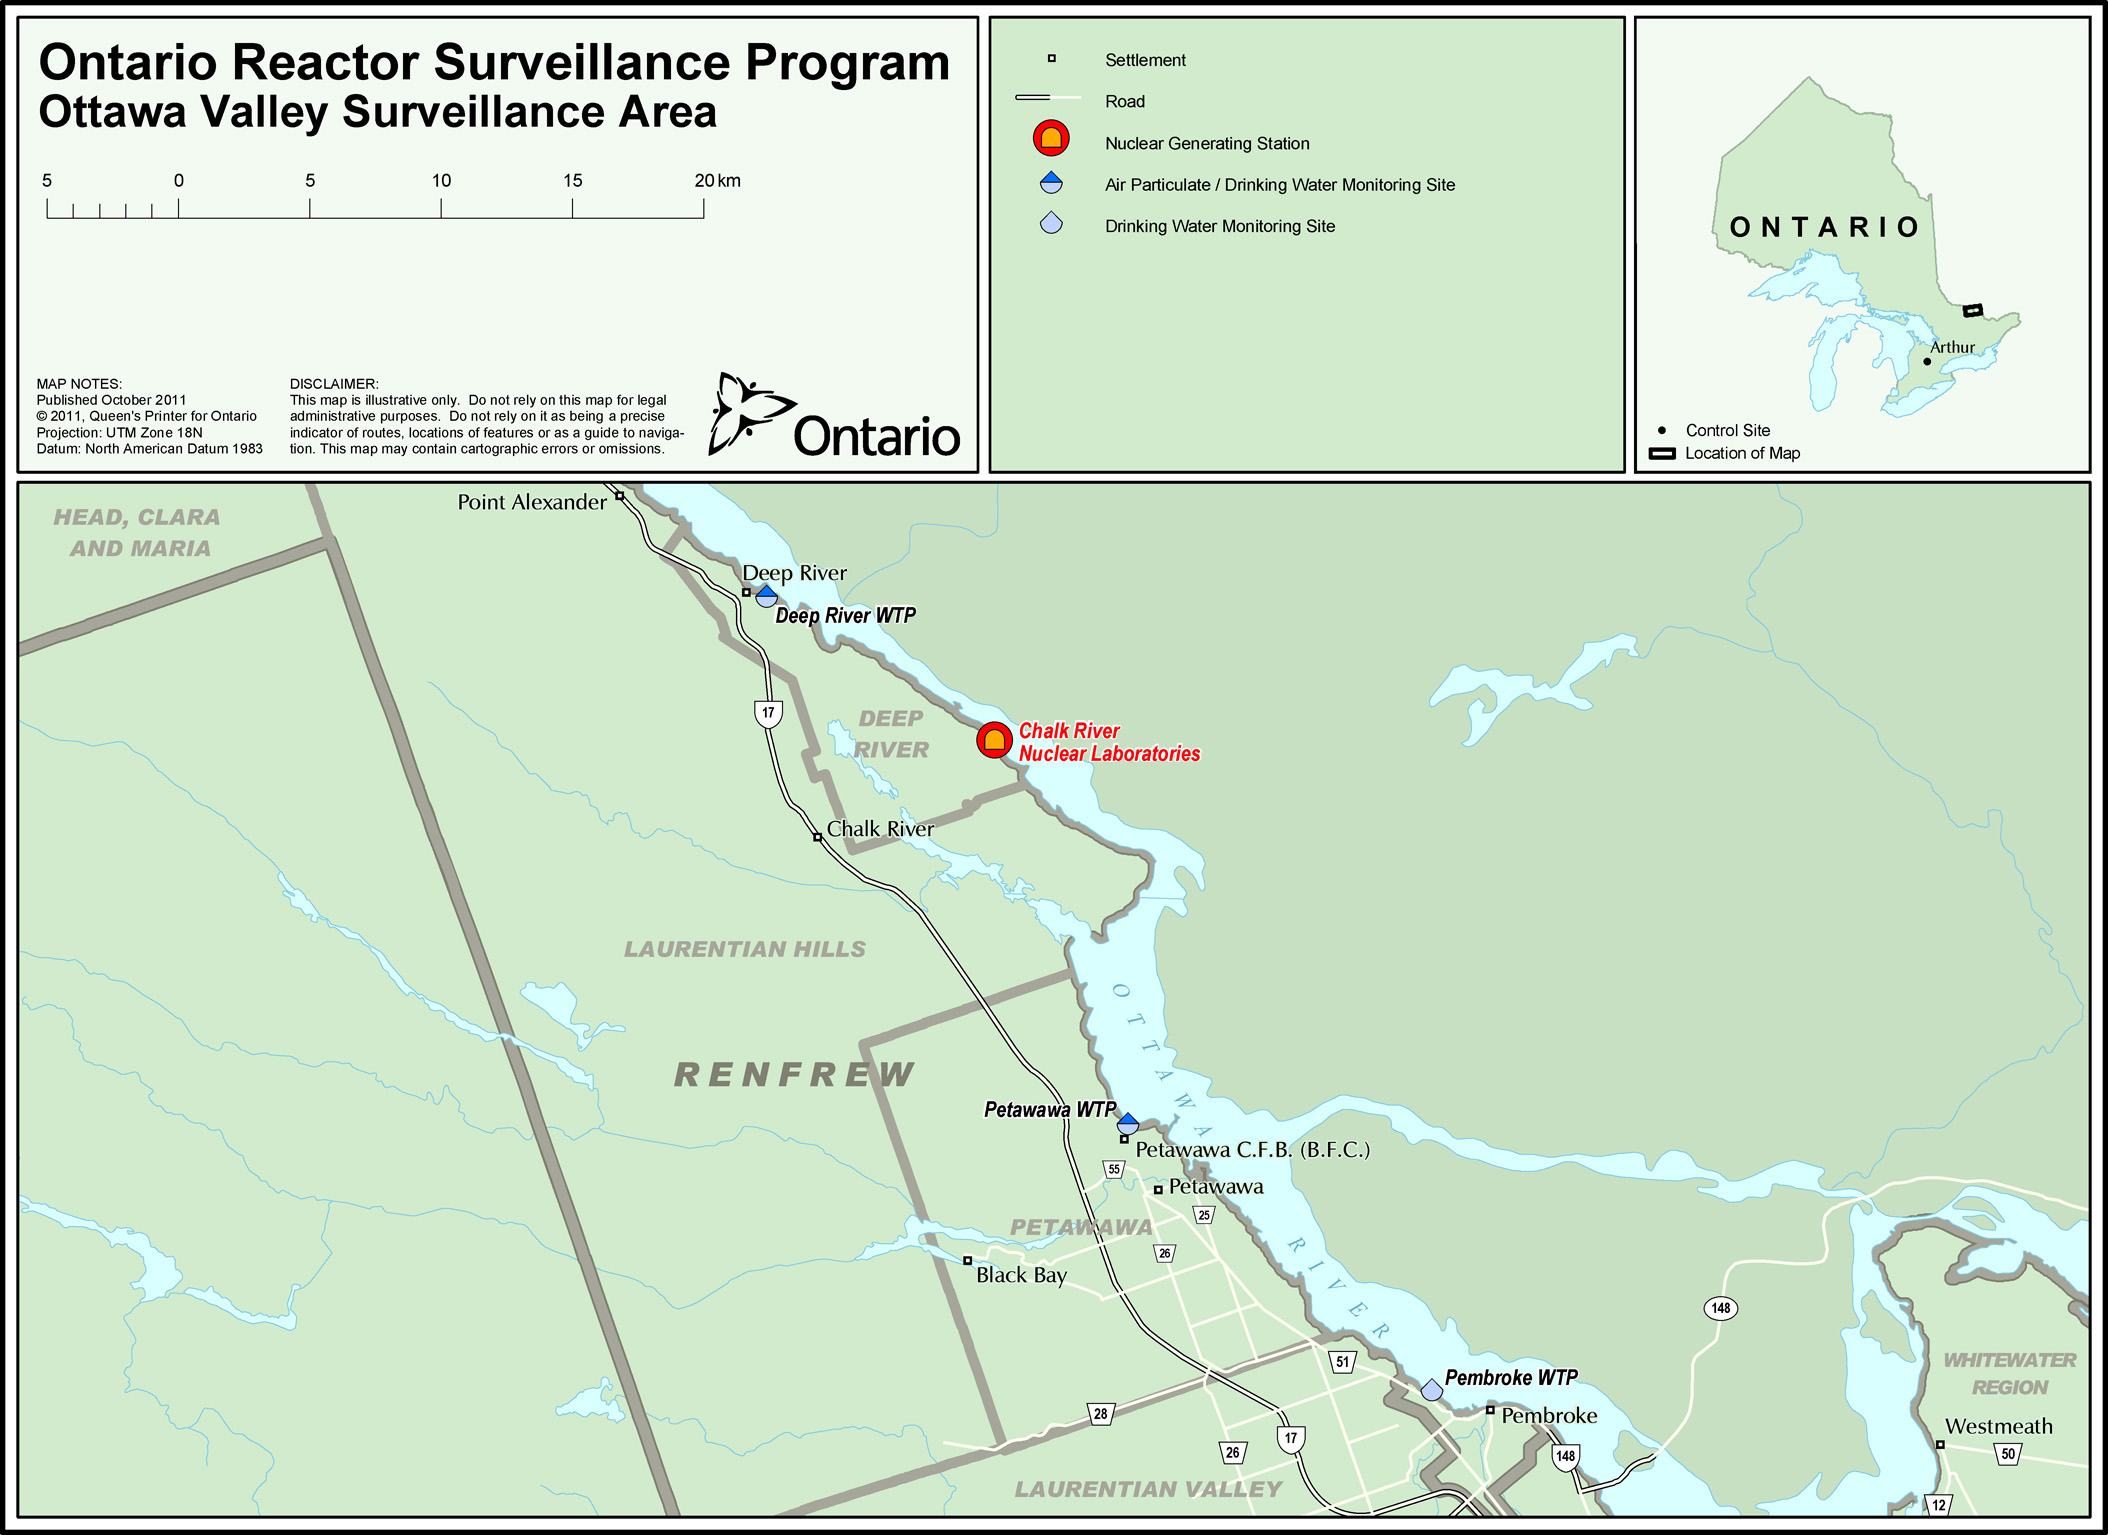 Map 5 Ottawa Valley Surveillance Area Nuclear Reactor